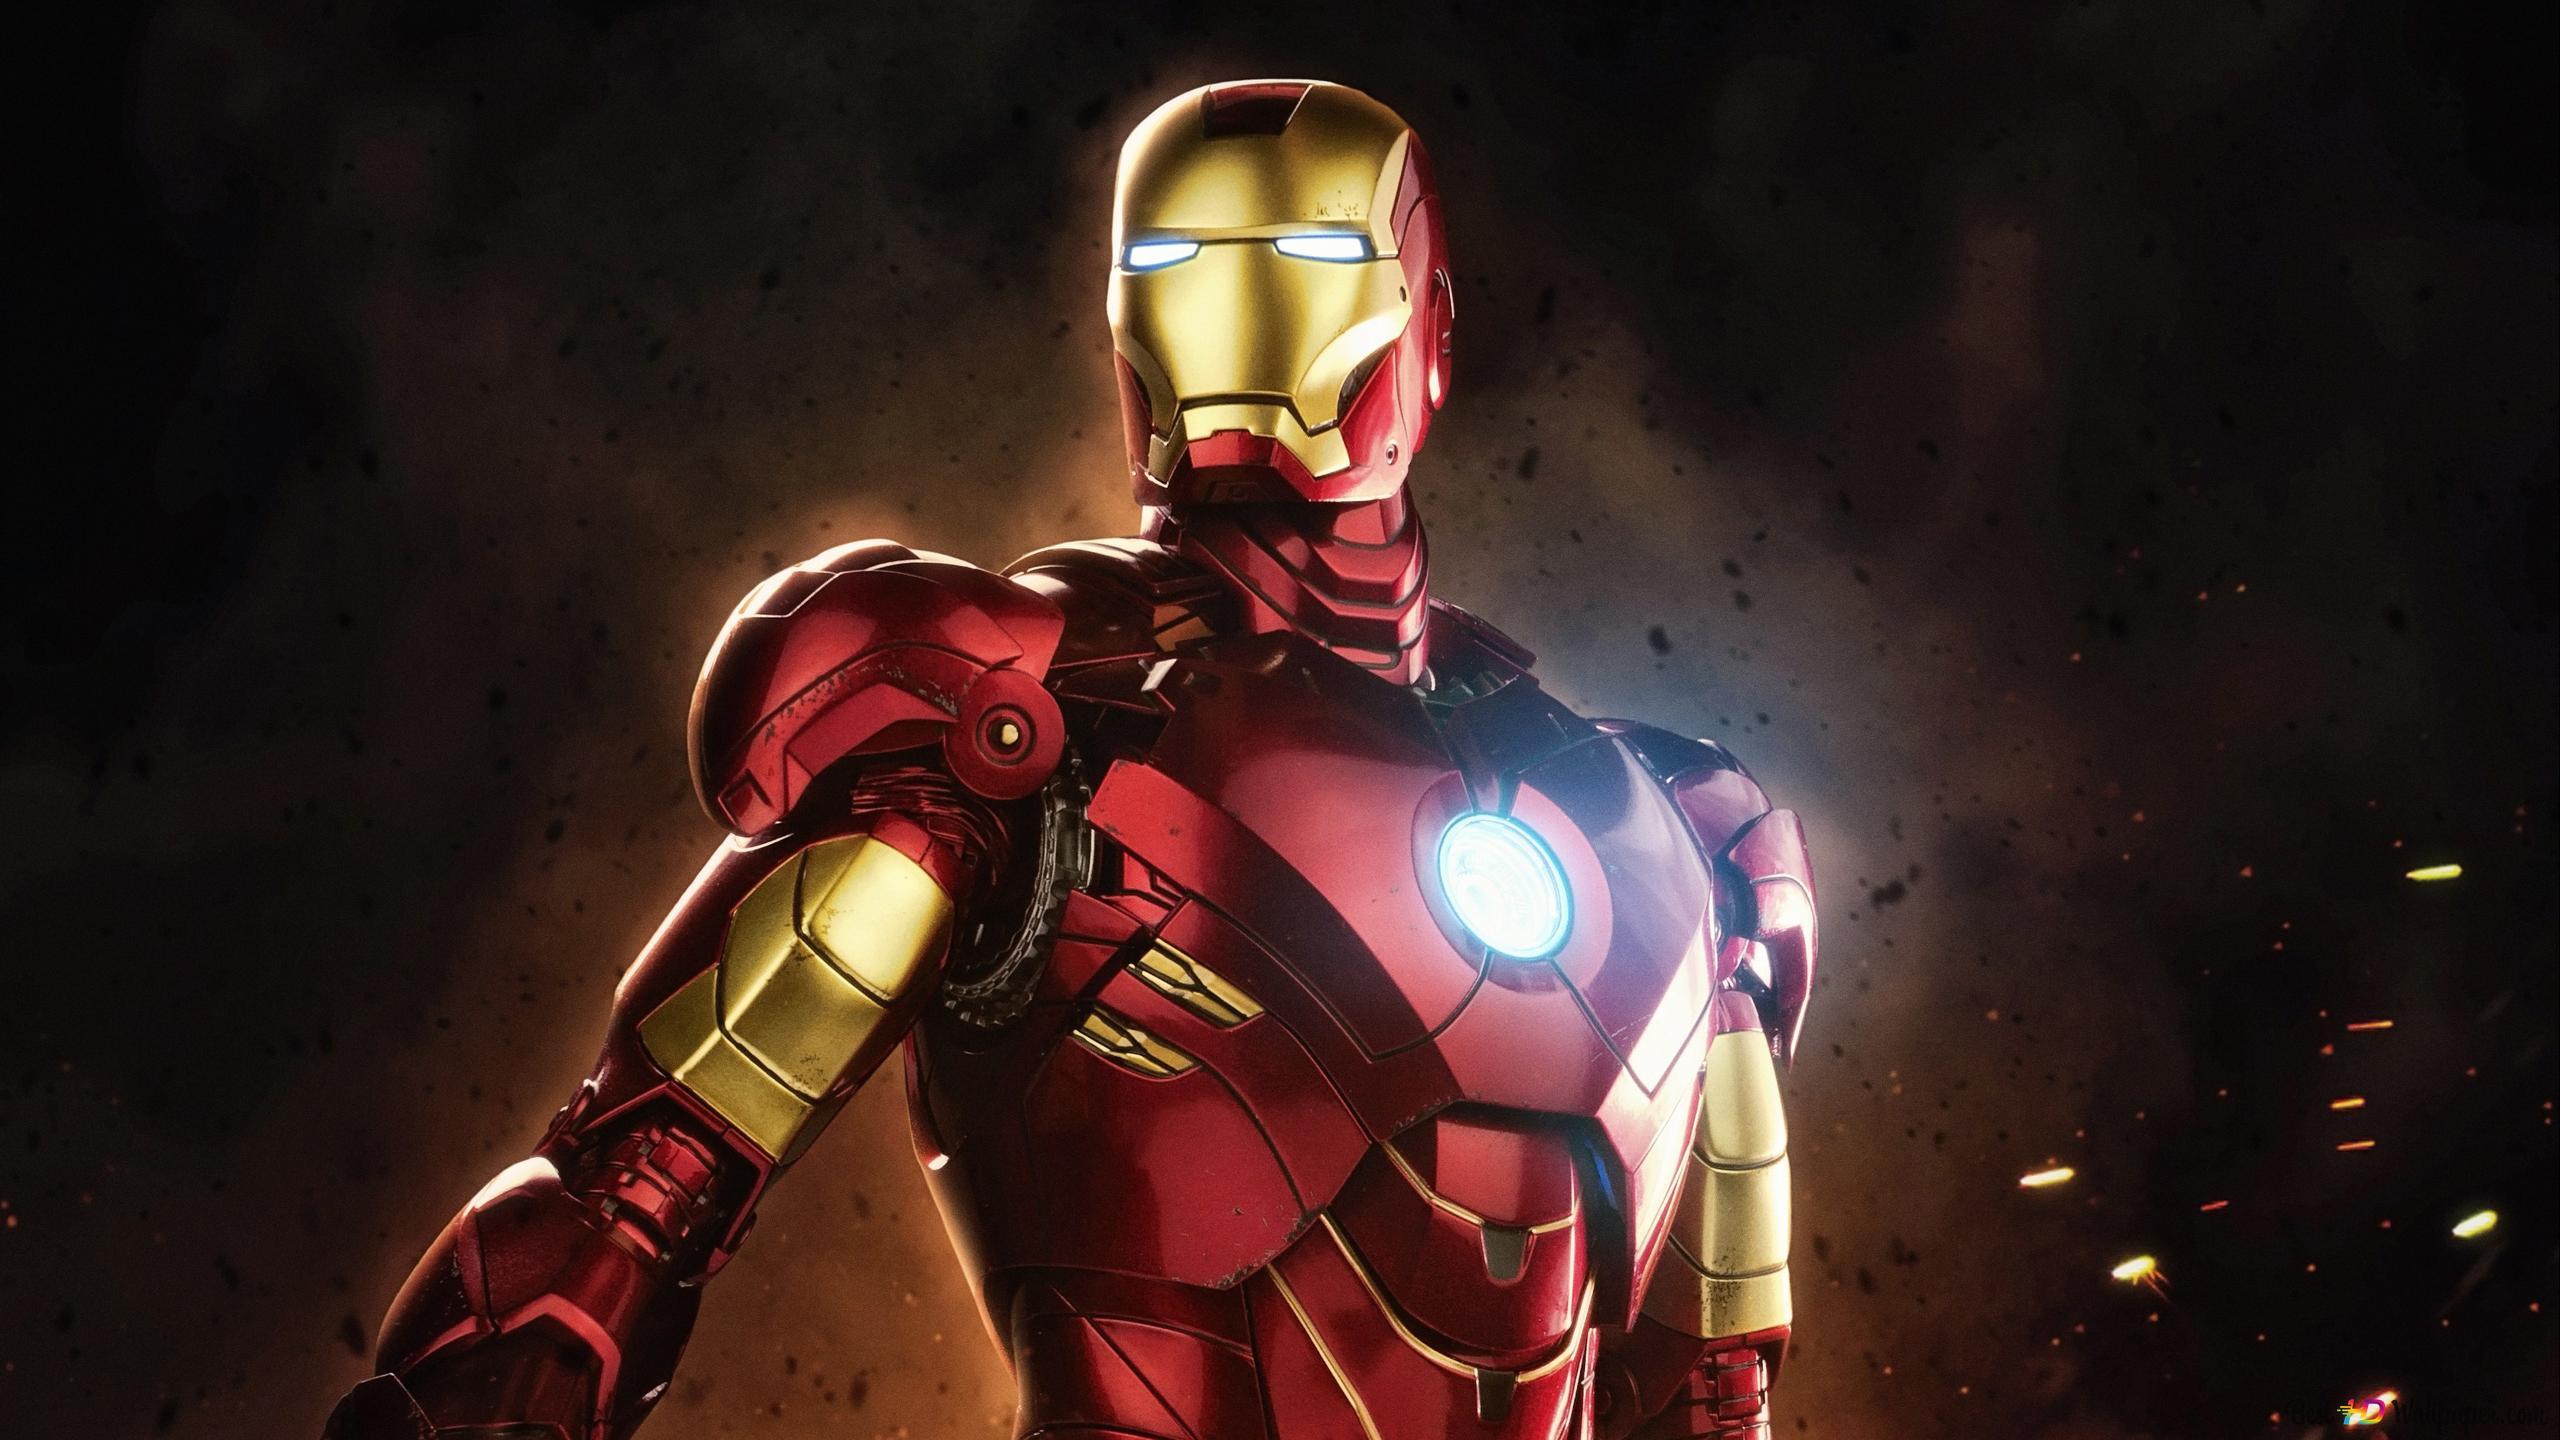 Avengers Superhero Iron Man Unduhan Wallpaper Hd